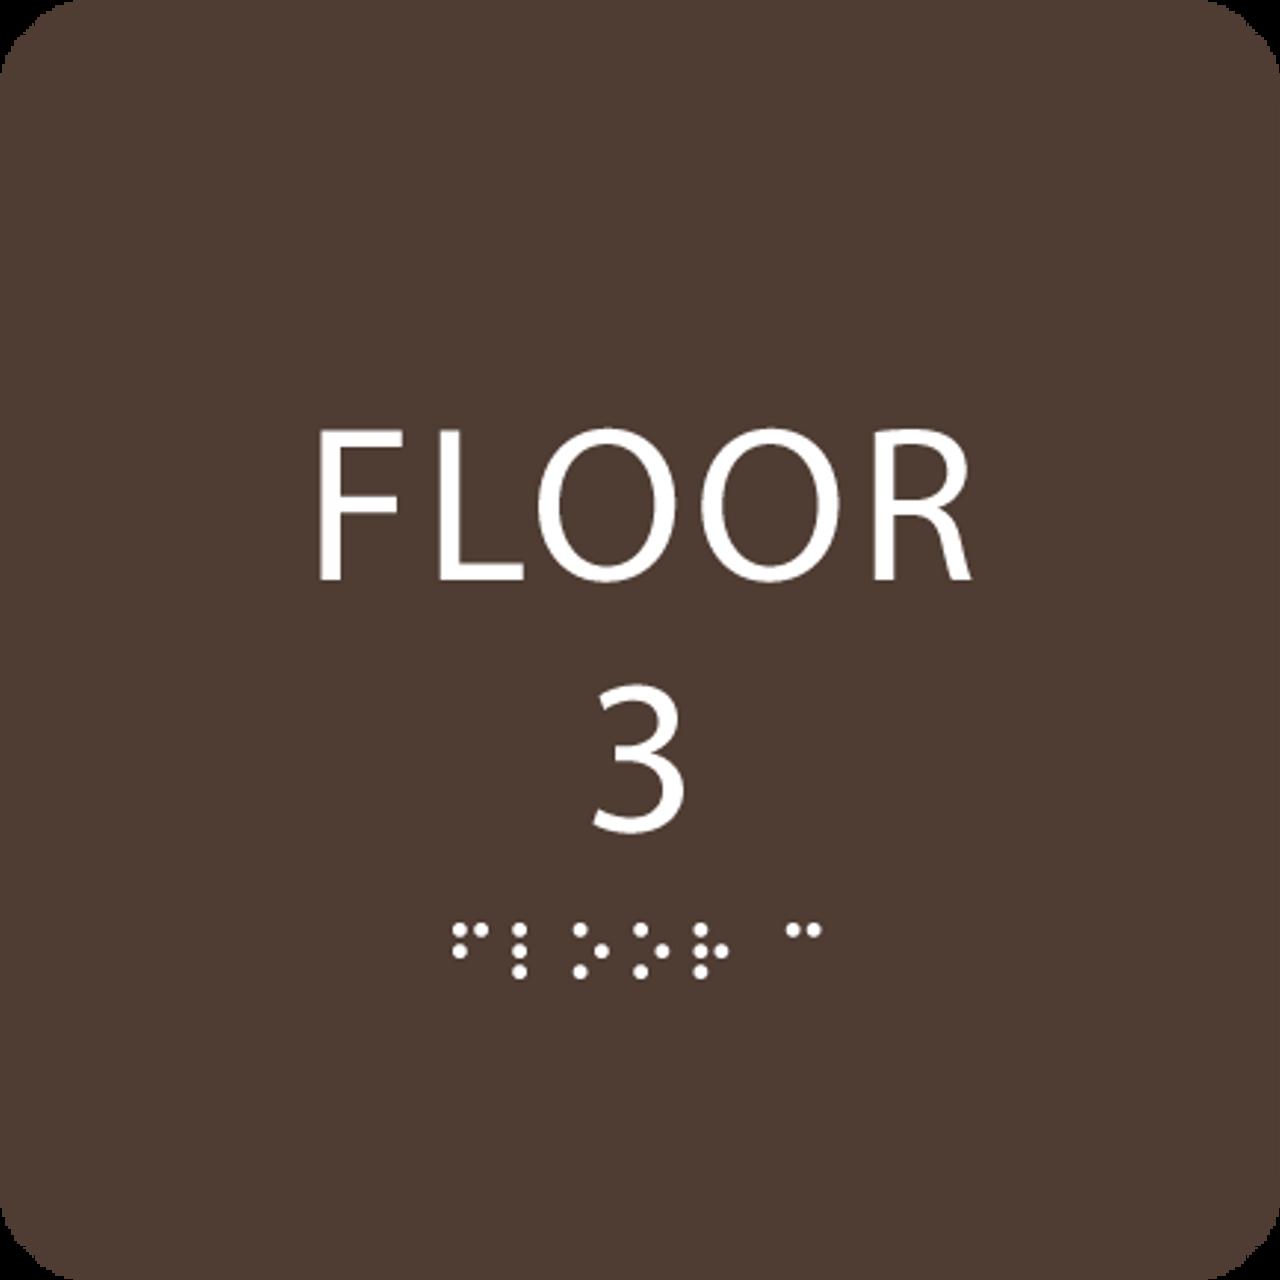 Dark Brown Floor 3 Identification Sign